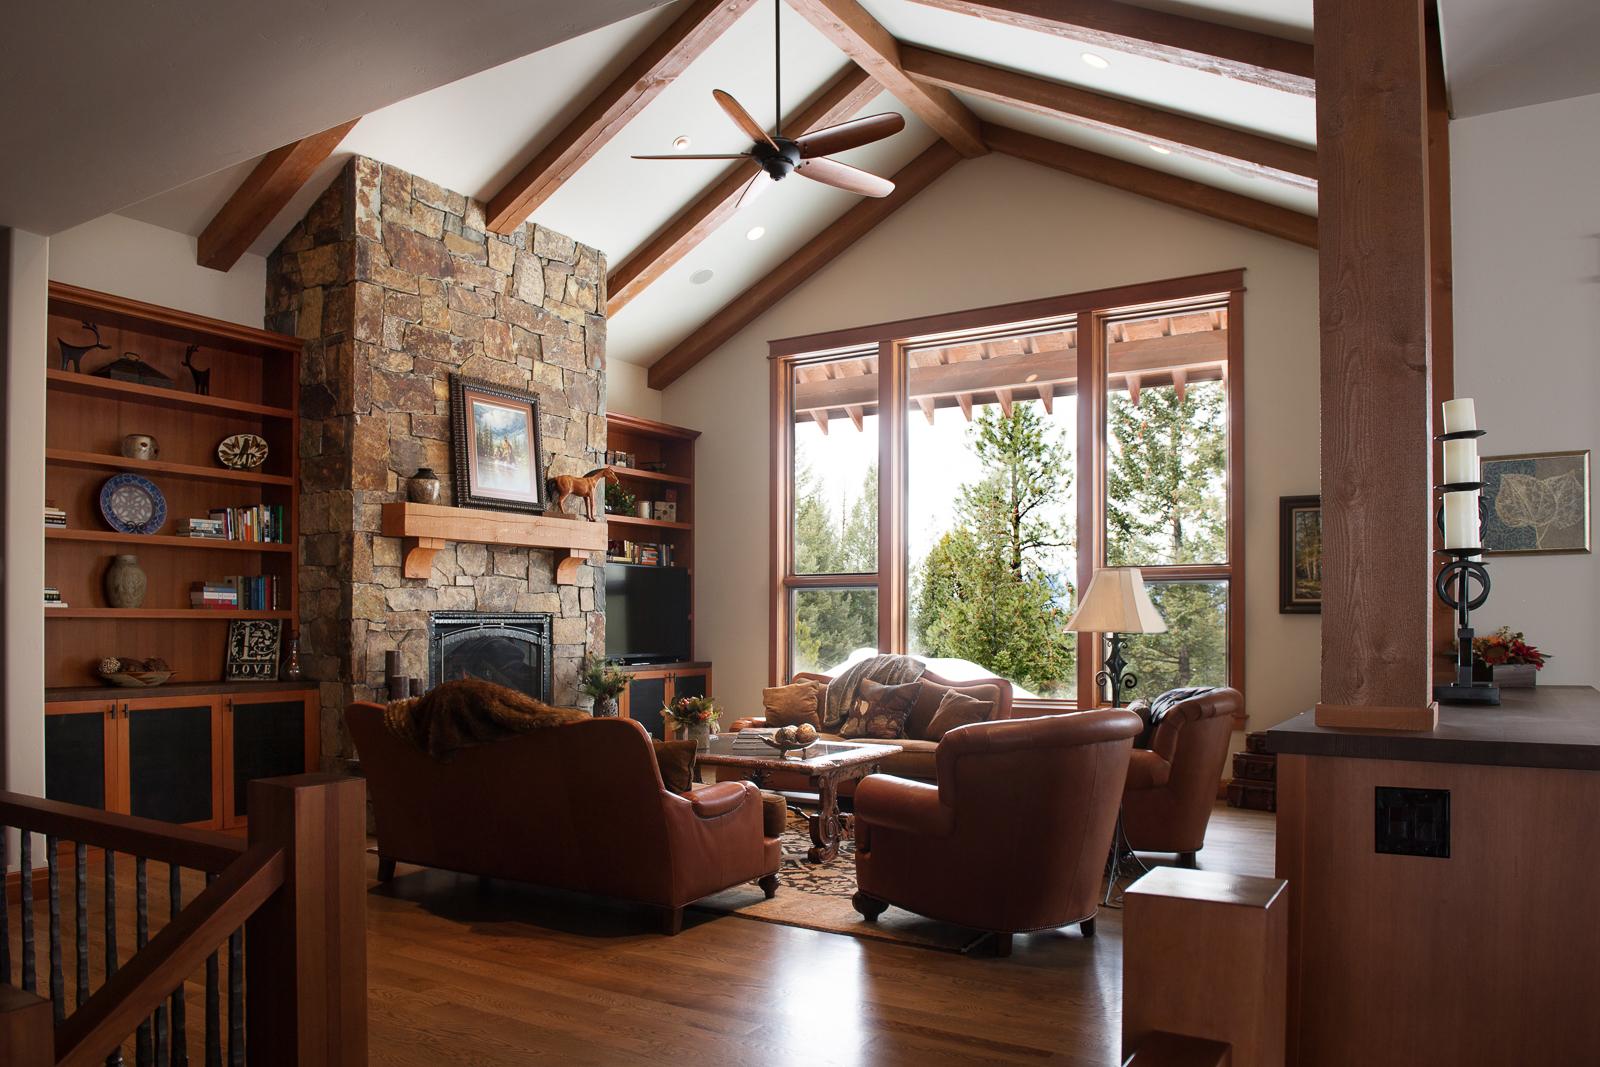 Woodworks-West-Bozeman-Montana-Builder-Cabinetry-Remodel-New-Construction-3464.jpg